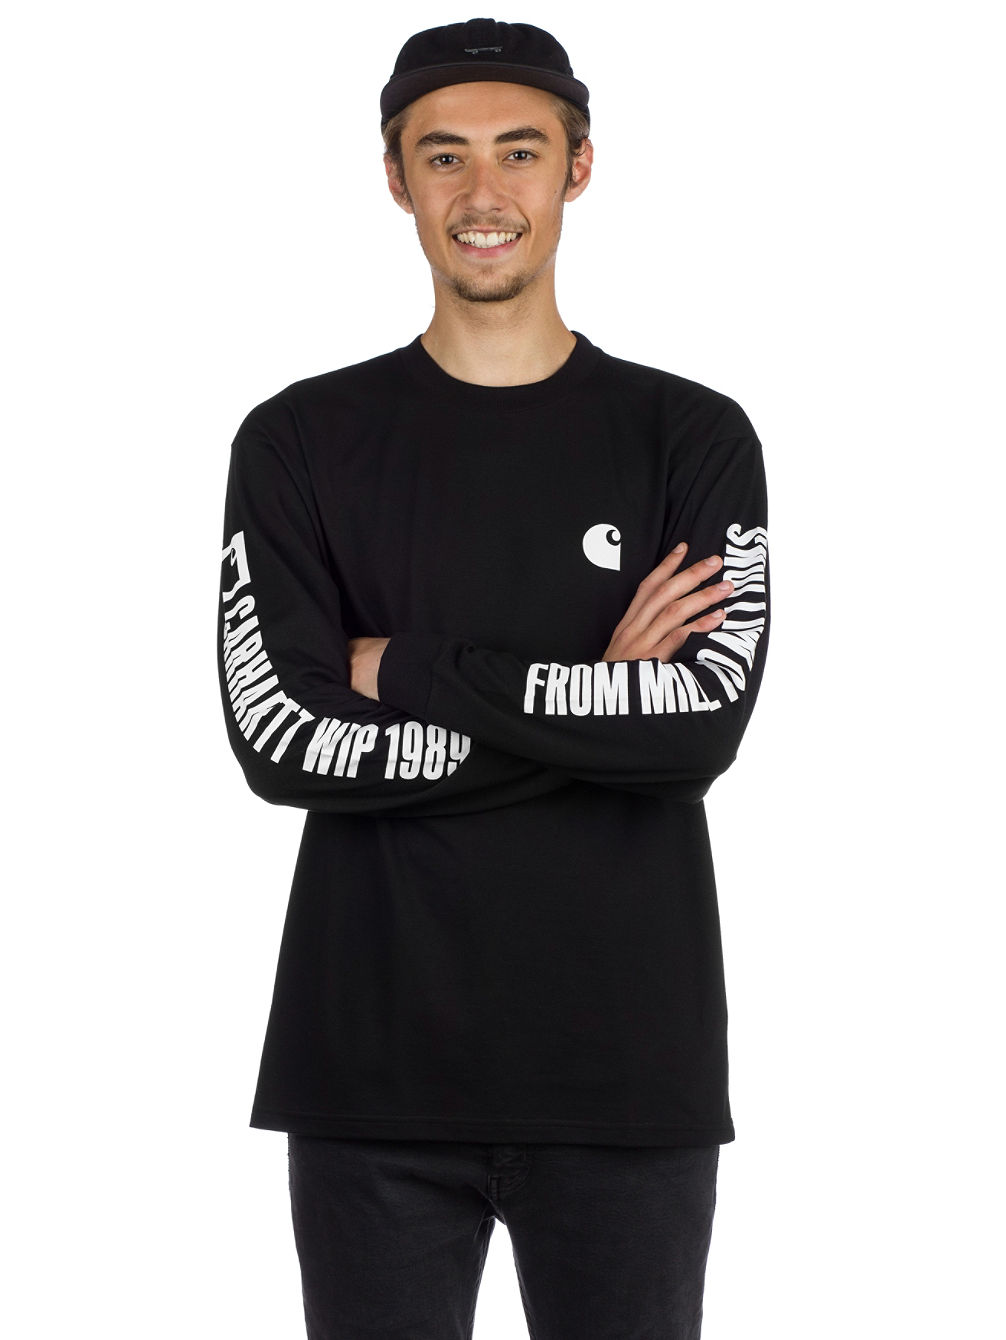 1989 Wip T-Shirt LS